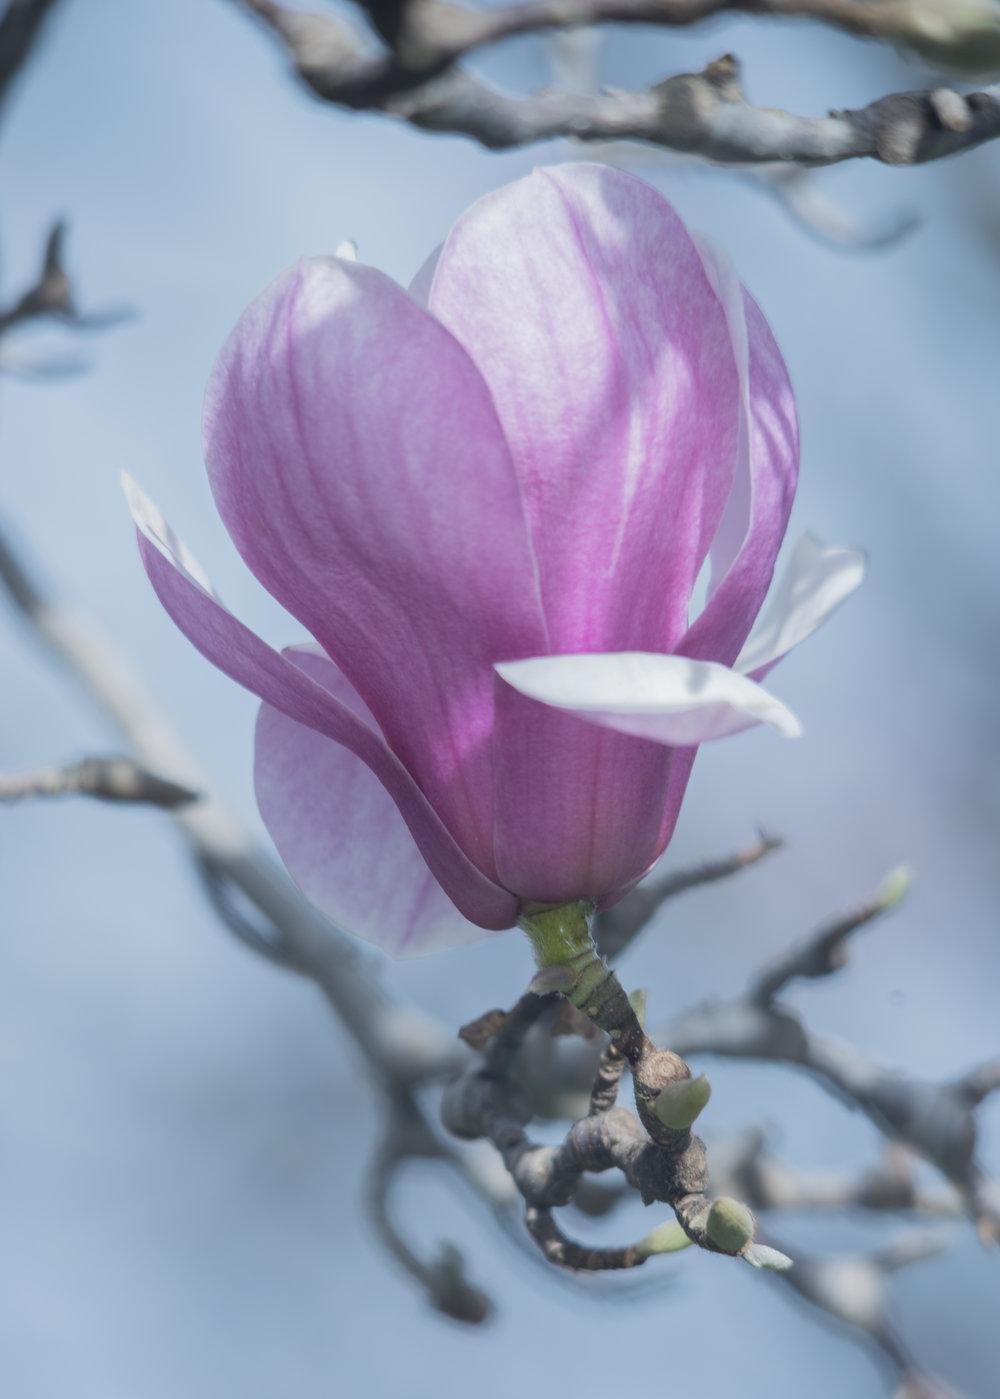 Rustica Rubra Magnolia in San Jose, California